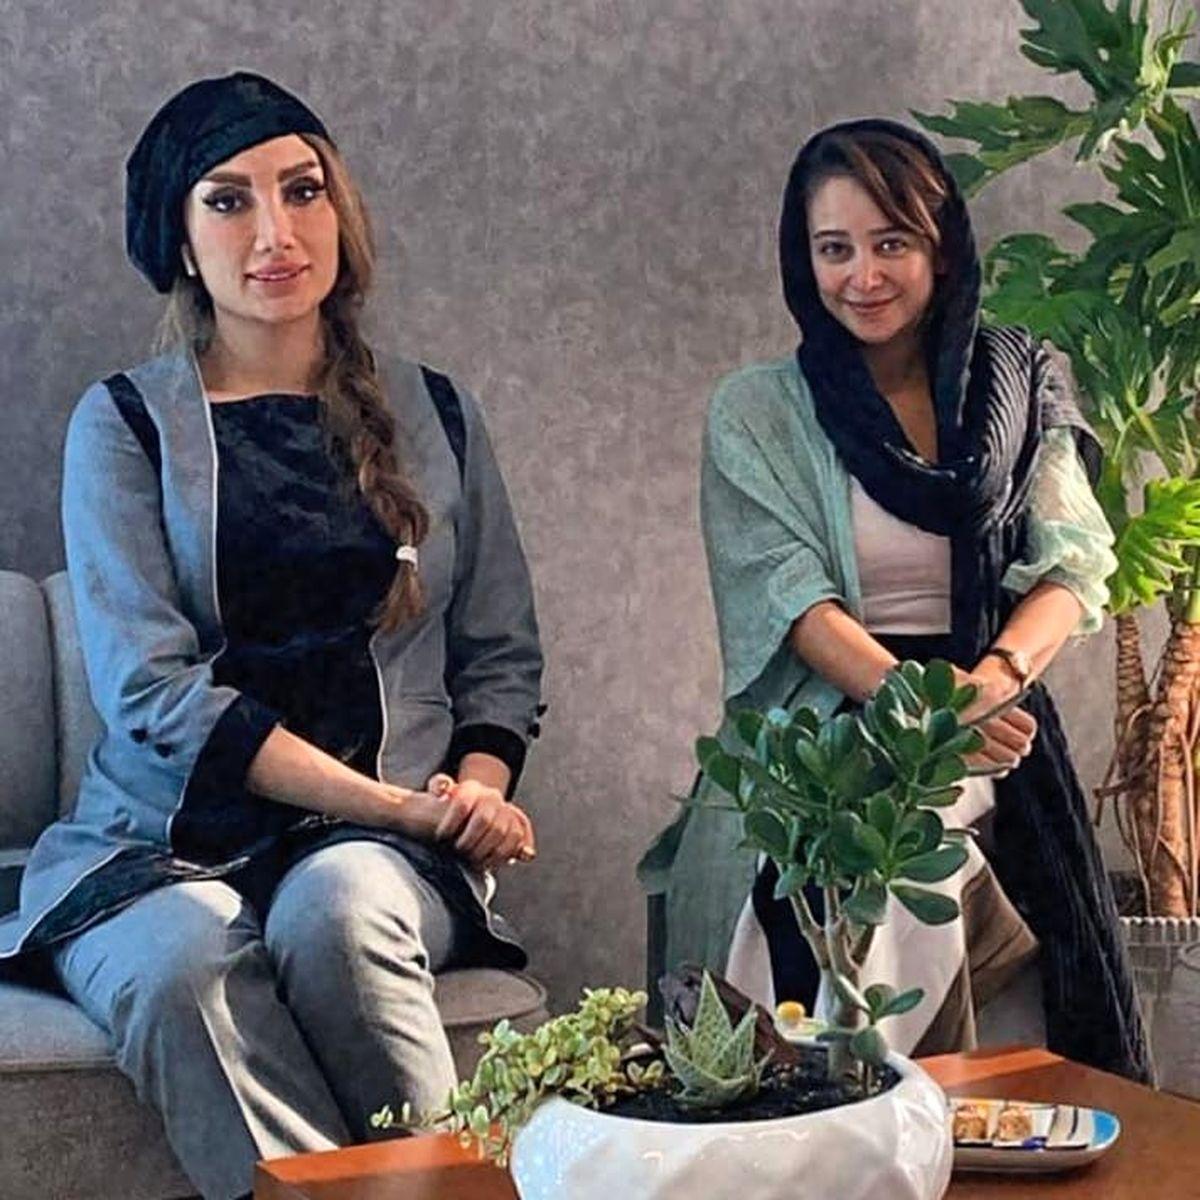 تیشرت سفید و چسبان الناز حبیبی + عکس